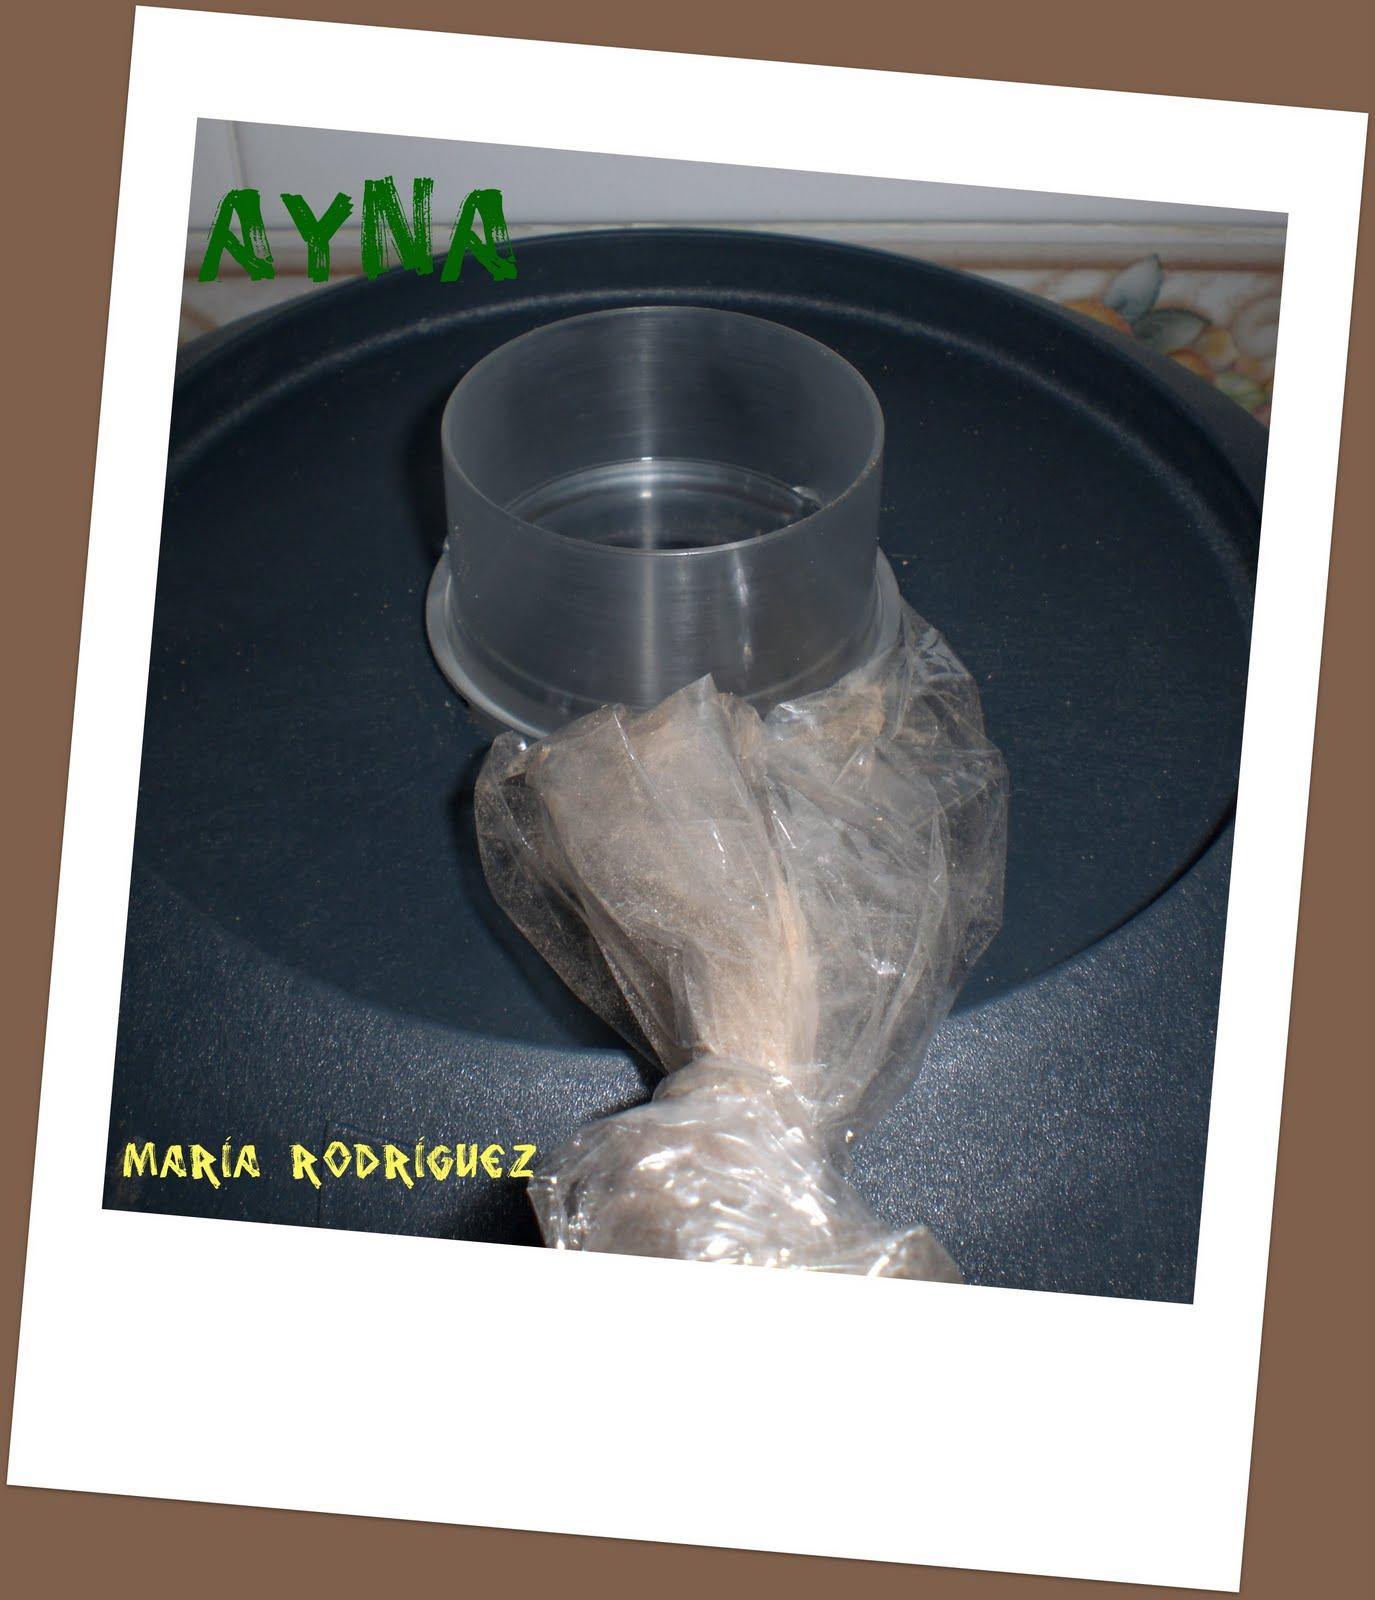 Ayna elmundodemaria chocolate al ba o mar a thermomix - Envasar al bano maria ...